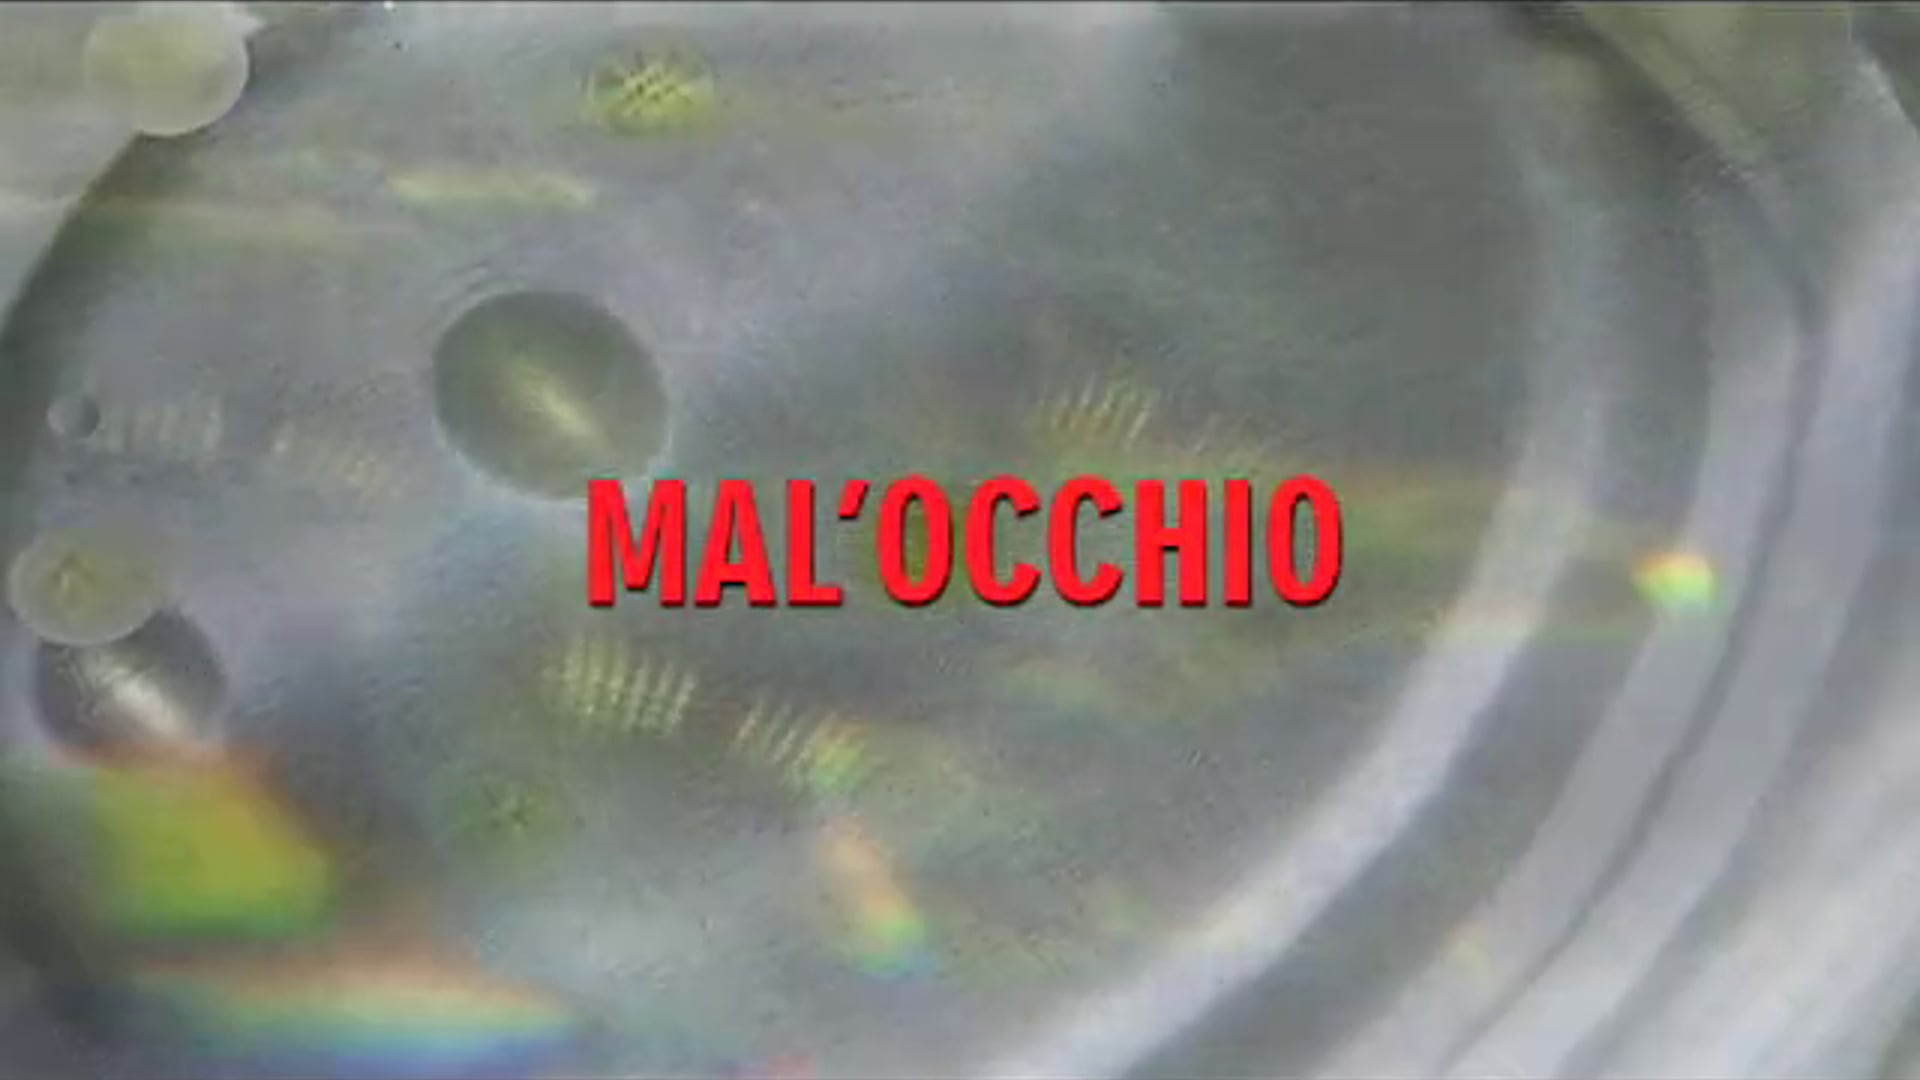 MAL'OCCHIO [THE EVIL EYE] TRAILER